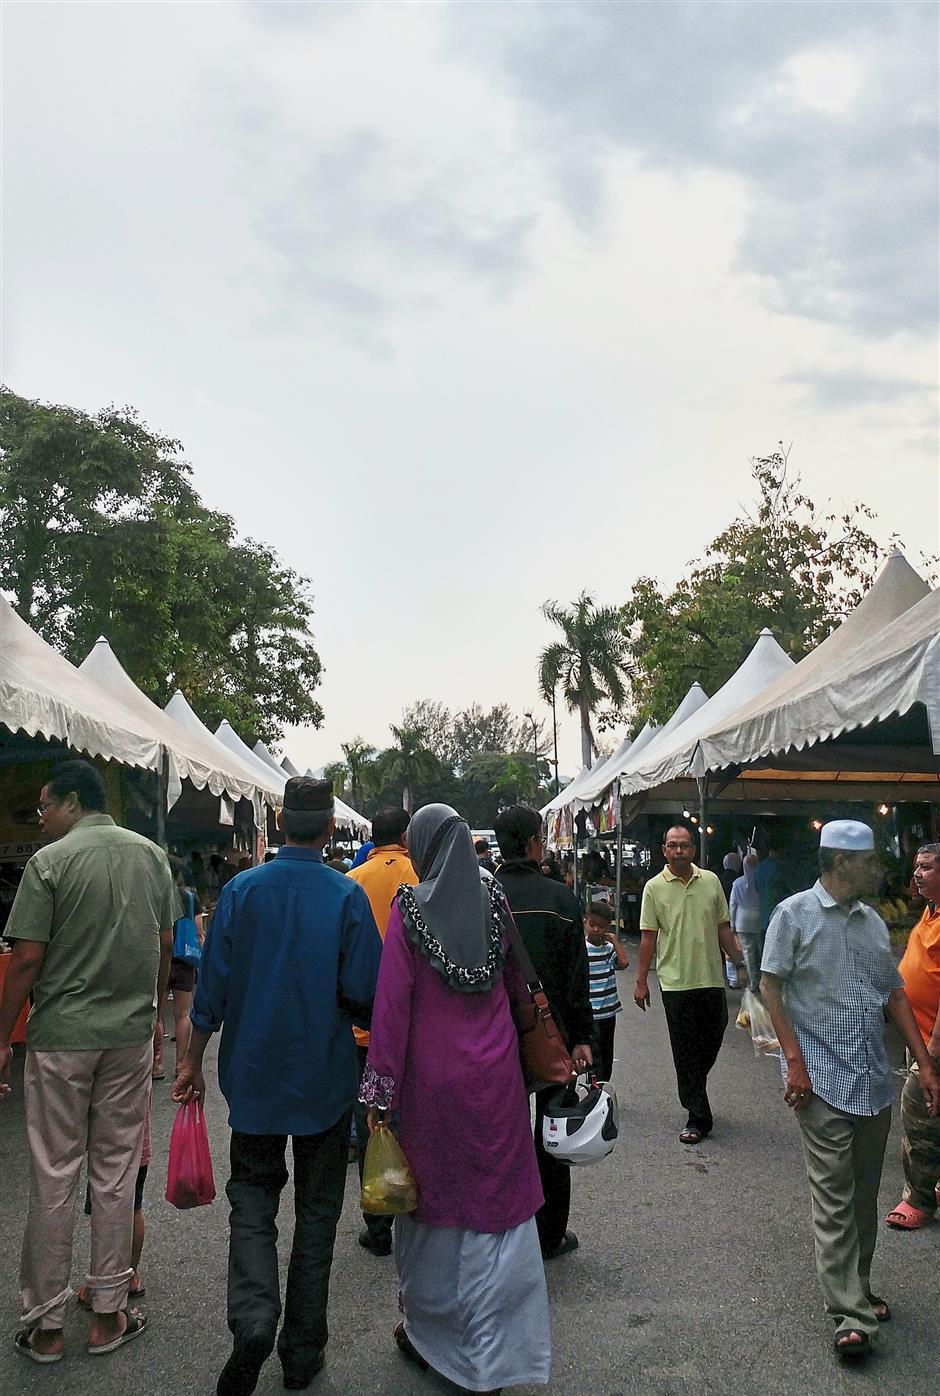 Gloomy clouds hovering over the Ramadan bazaar near the Perak Stadium.